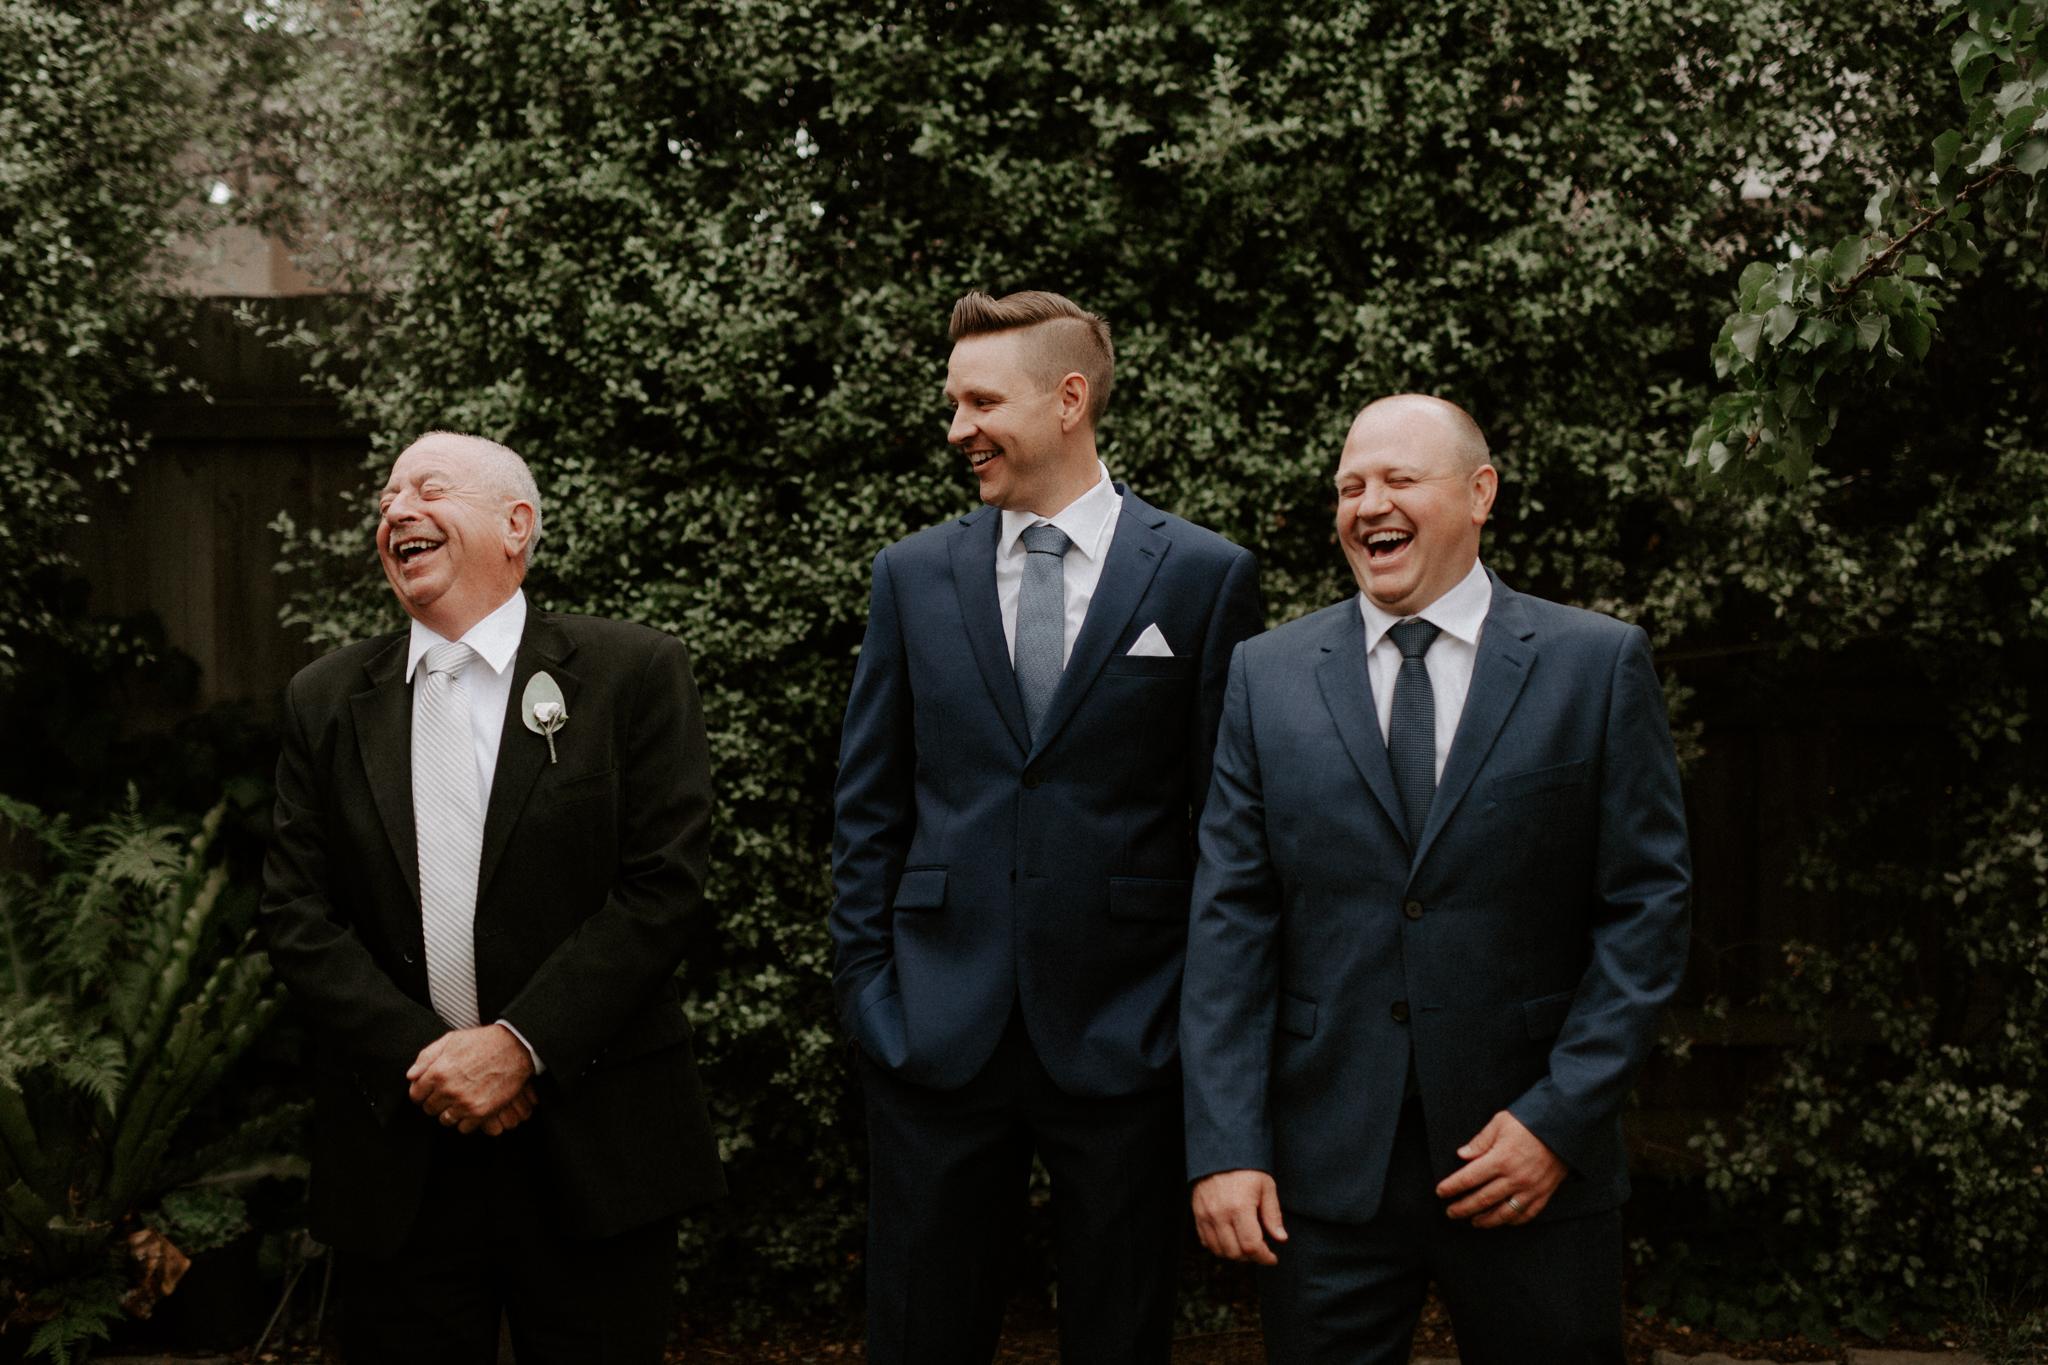 St-Kilda-Garden-Wedding-Emotions-and-Math-Photograph-015.jpg